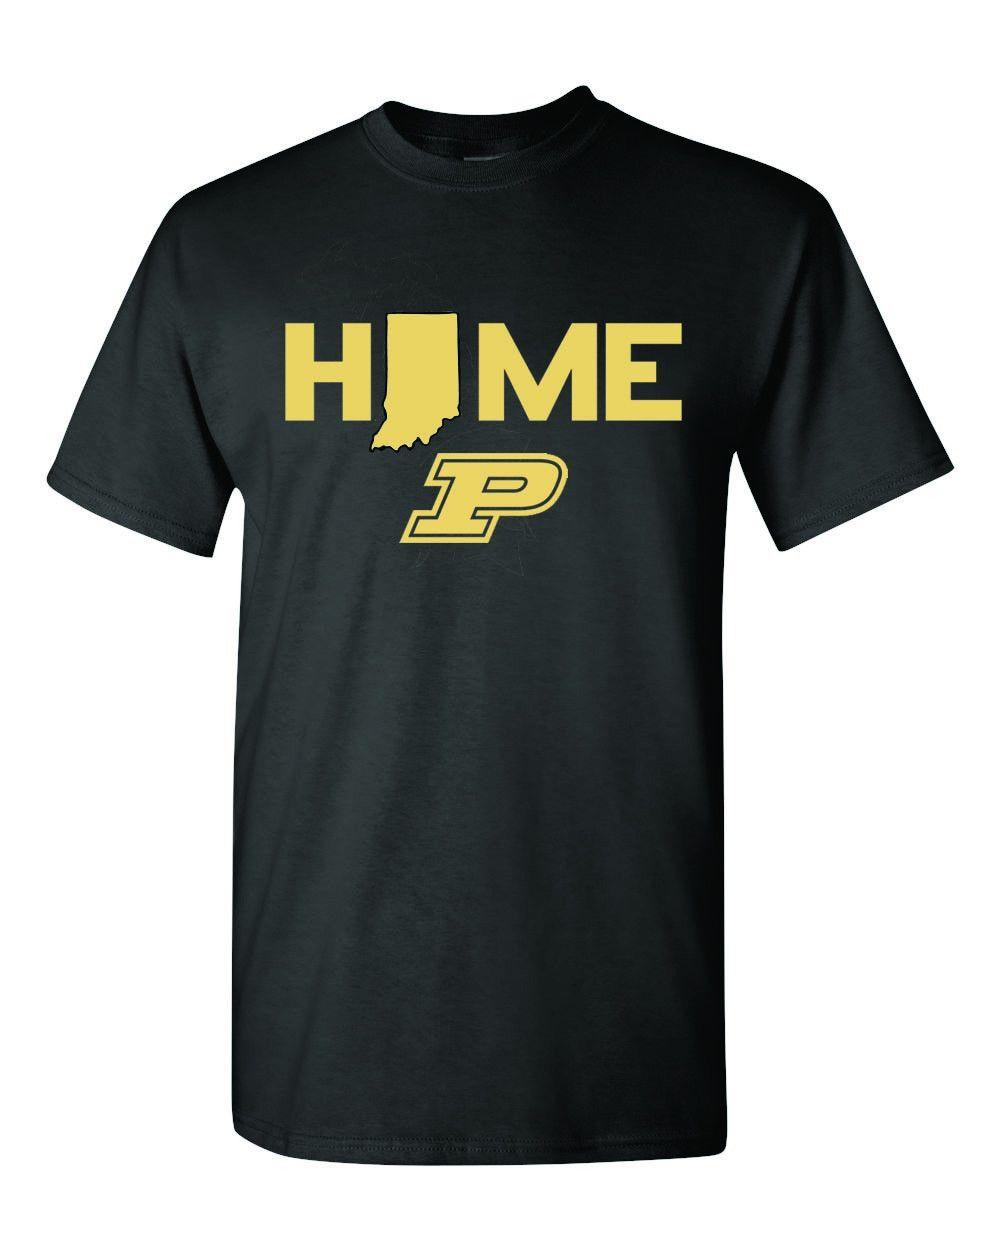 Color printing purdue - Purdue University Home T Shirt